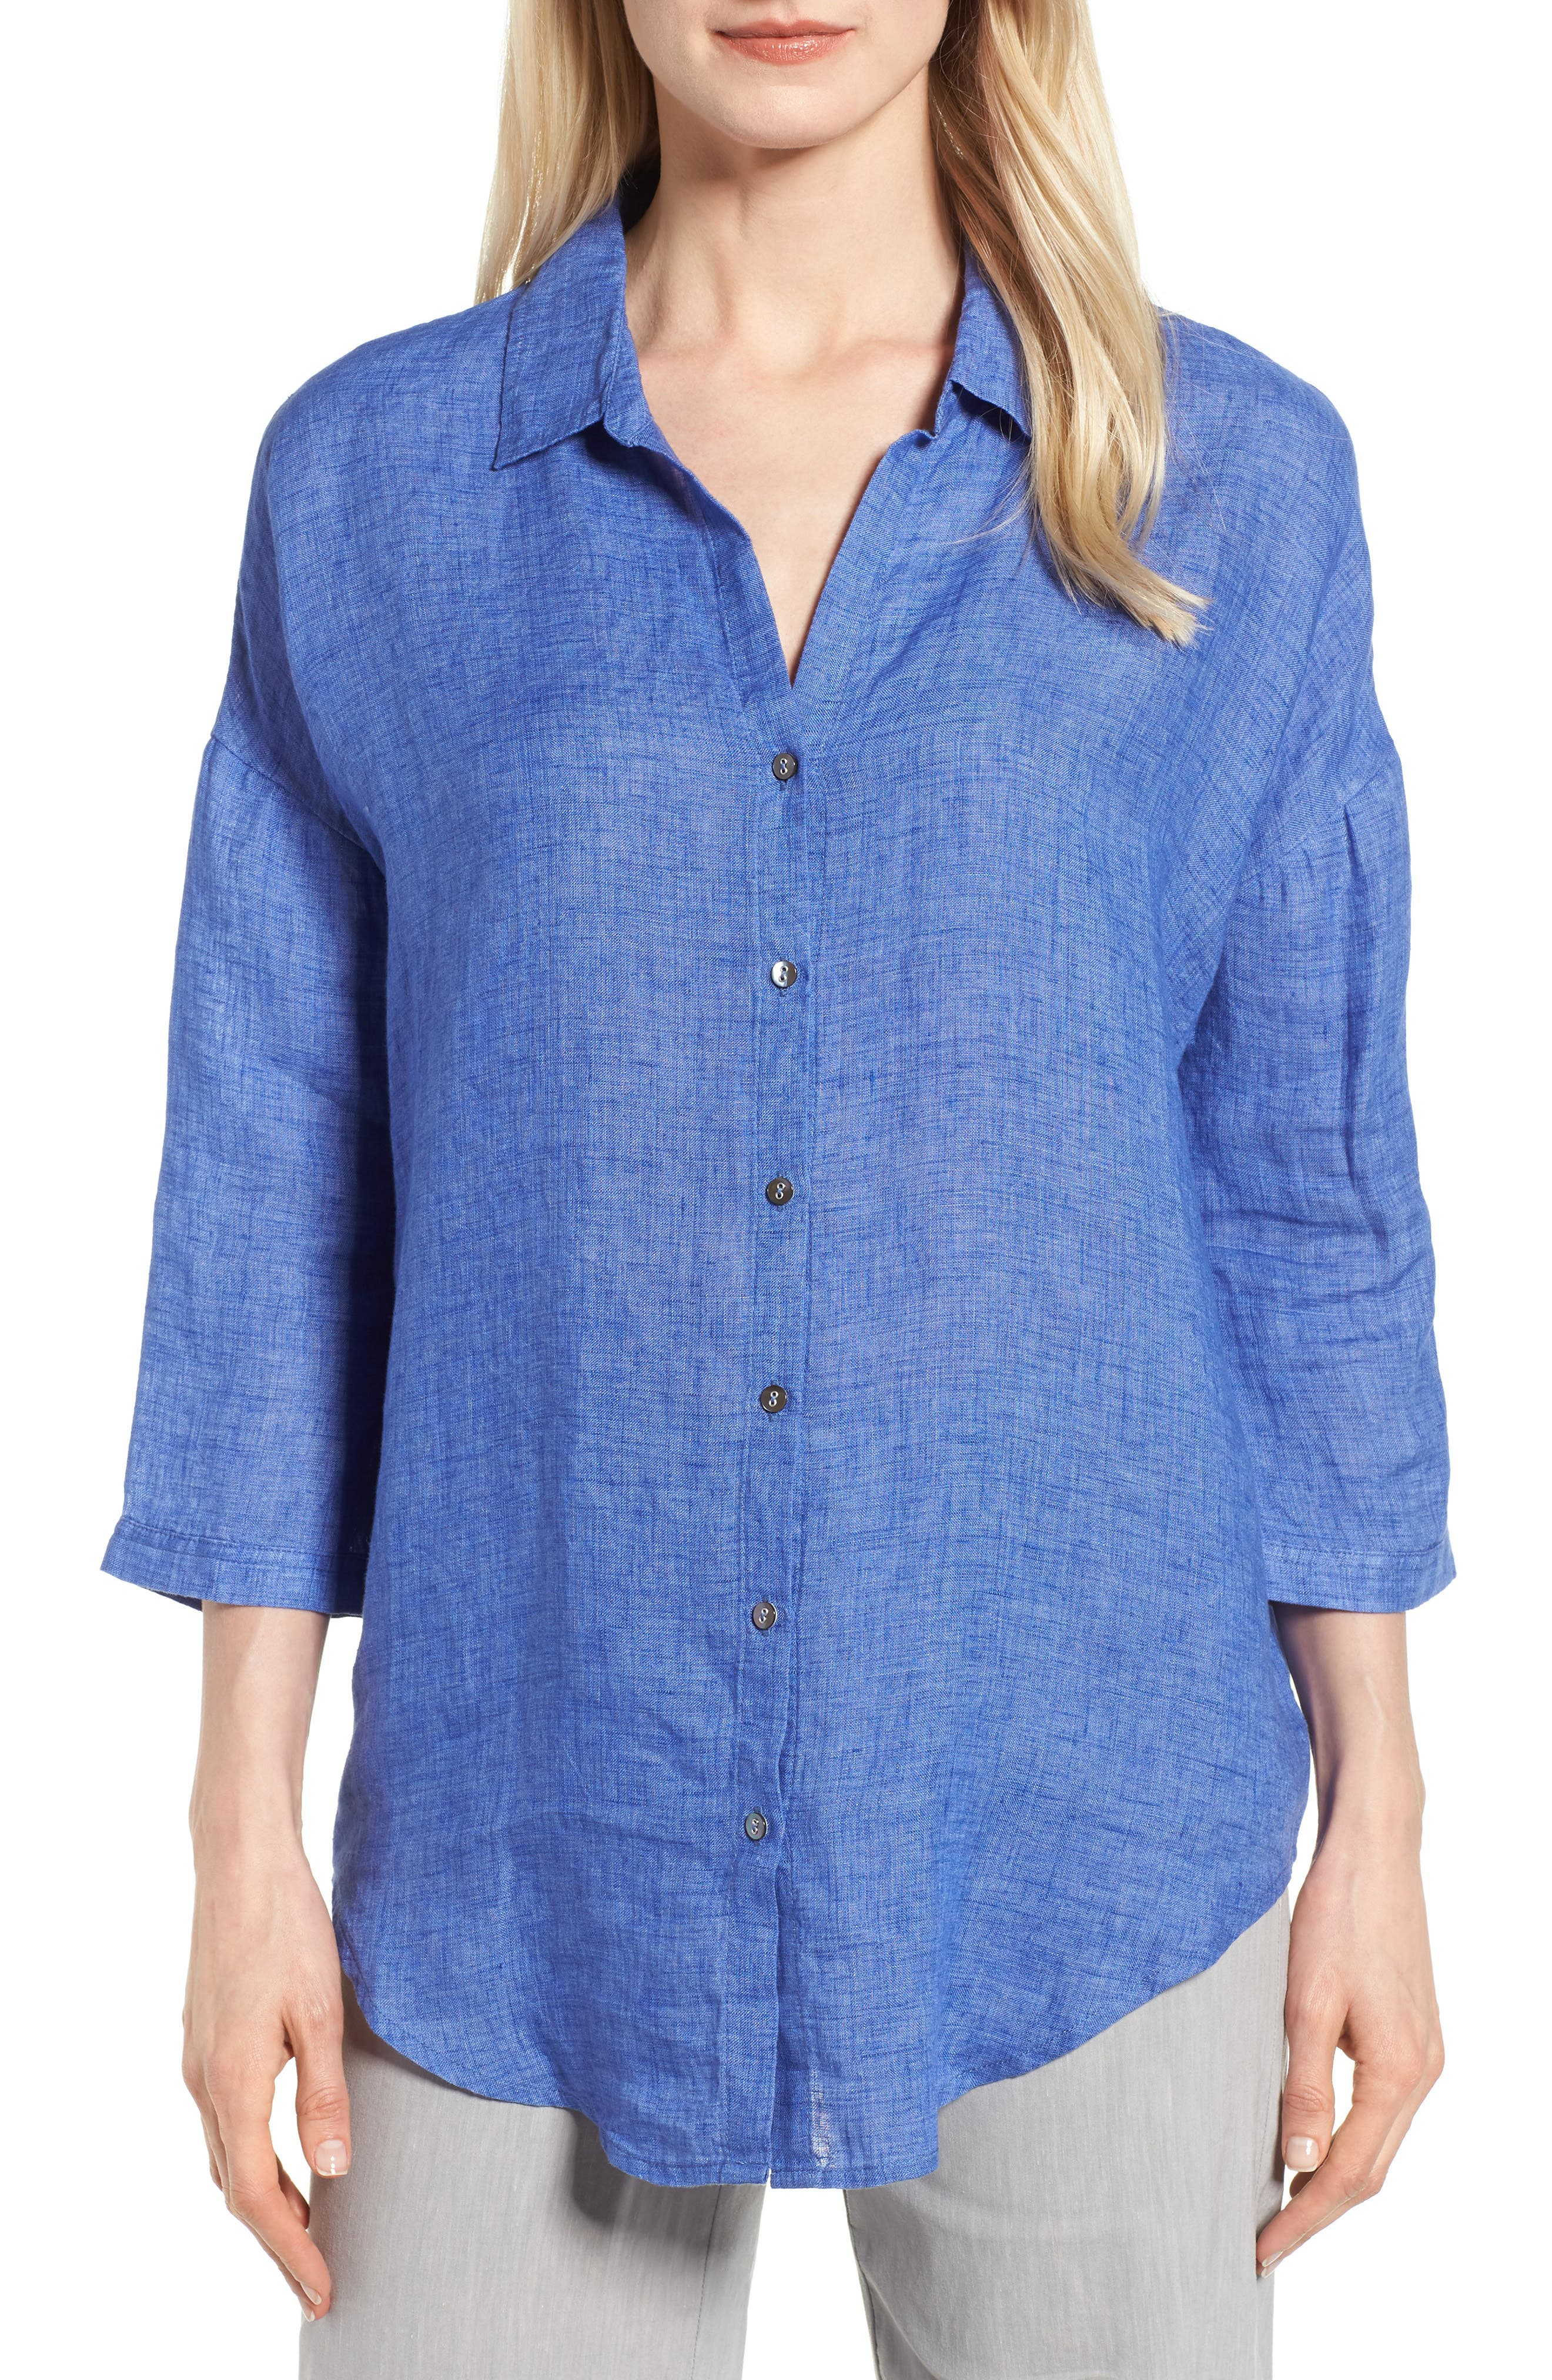 Joy Ride Linen Tunic Top,                         Main,                         color, 487